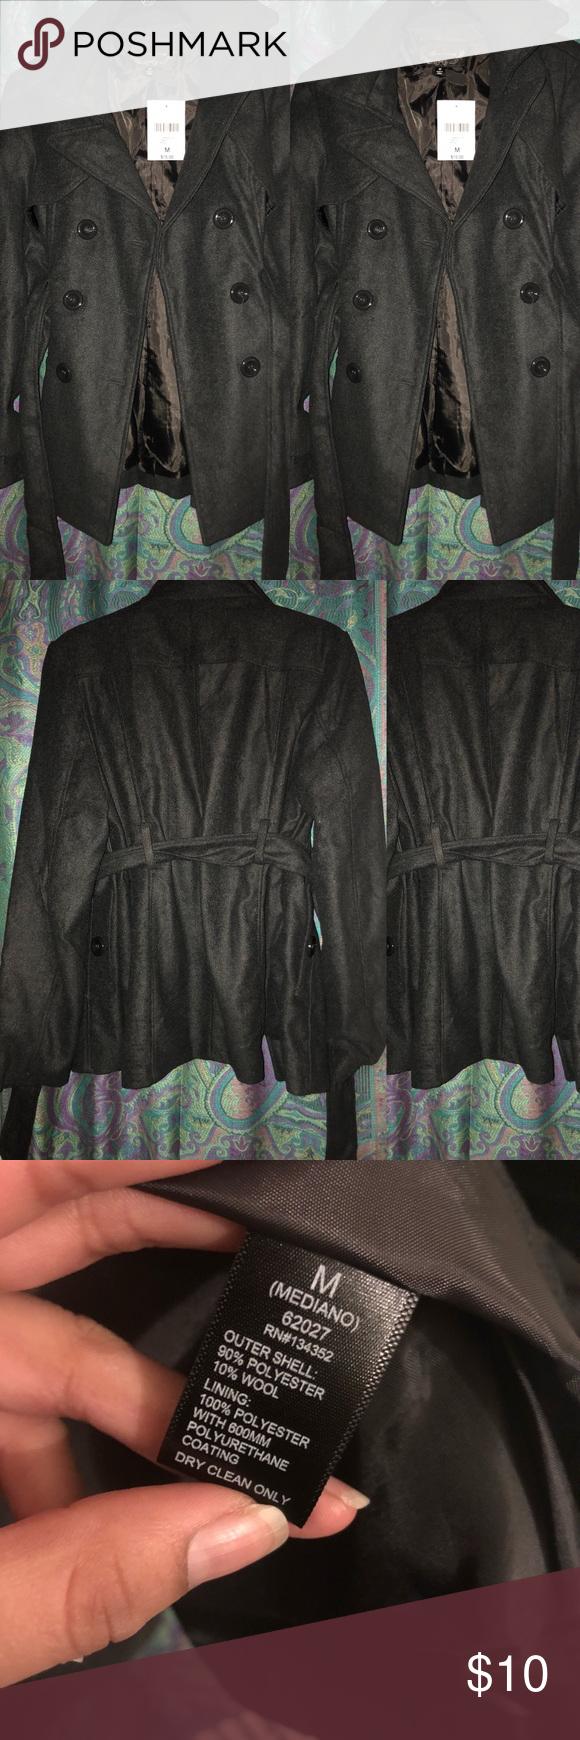 Dark Grey jacket Never worn brand new                       size:medium color: dark grey Forever 21 Jackets & Coats